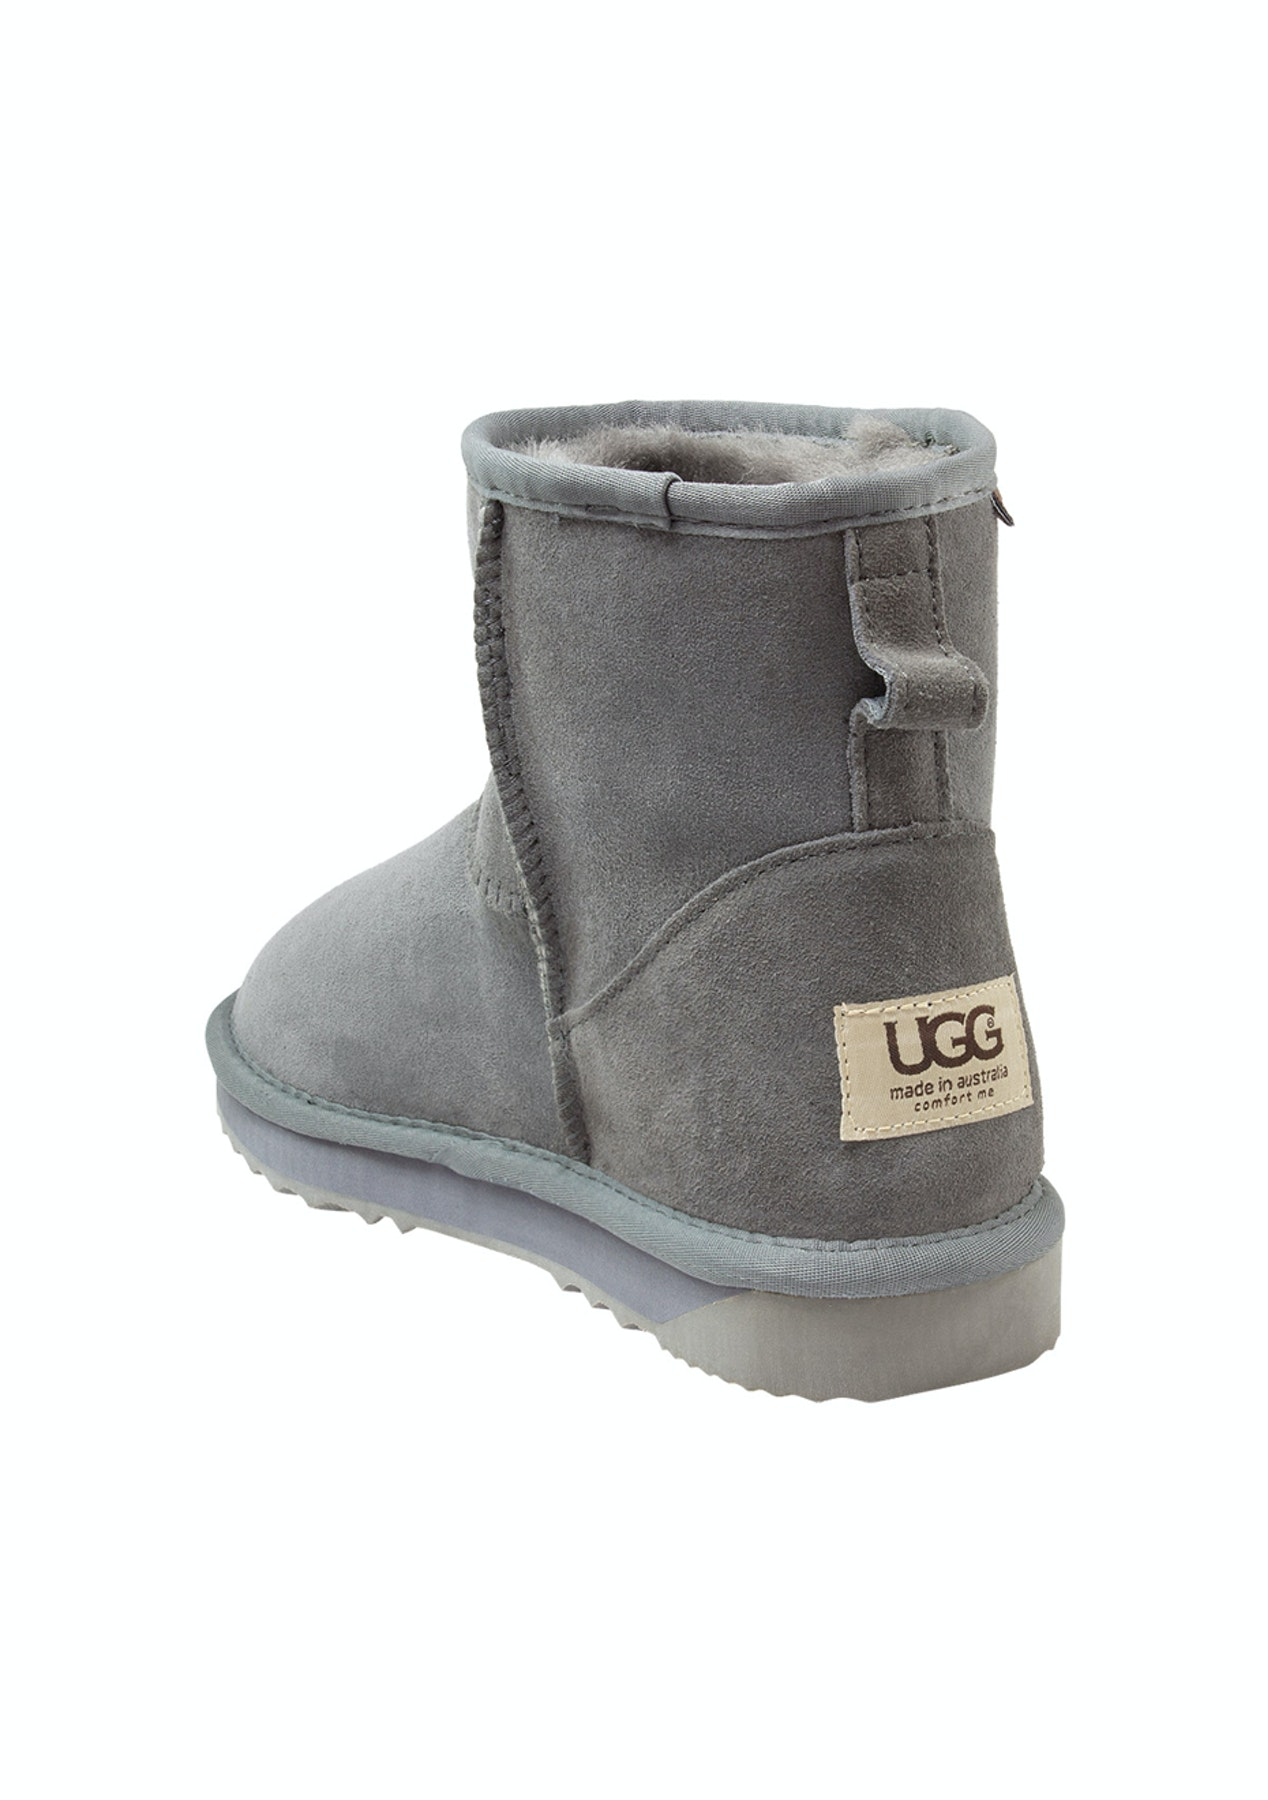 19565d61511 Ugg Comfort Me Australia Ultra Short Classic Grey-10